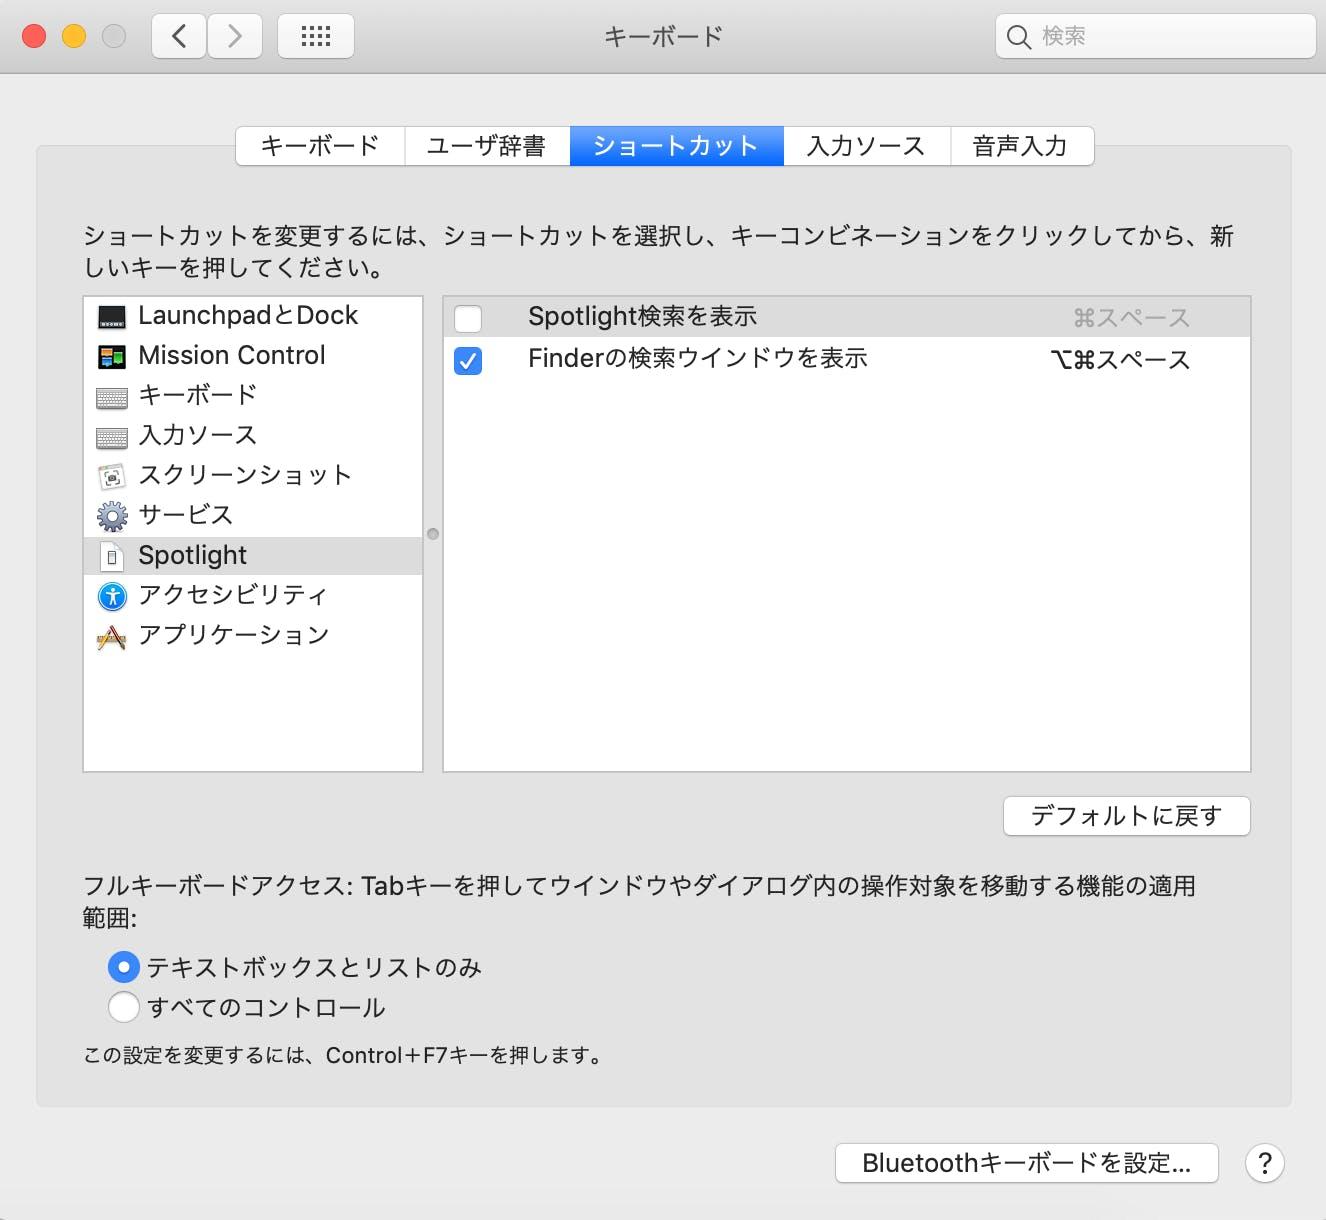 Macセットアップ時にやったことメモ - Qiita